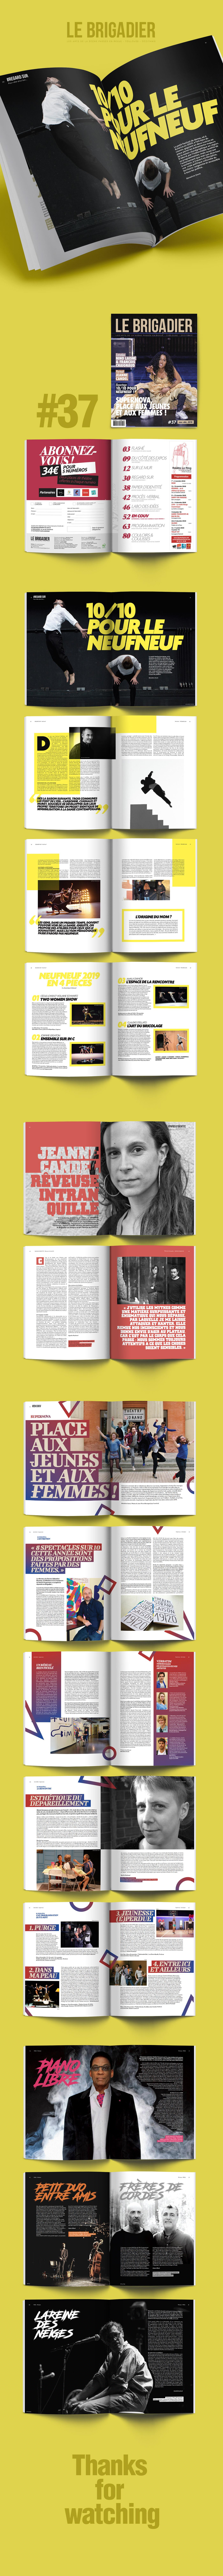 ArtDirection creation design directionartistique graphic Layout lebrigadier magazine miseenpage